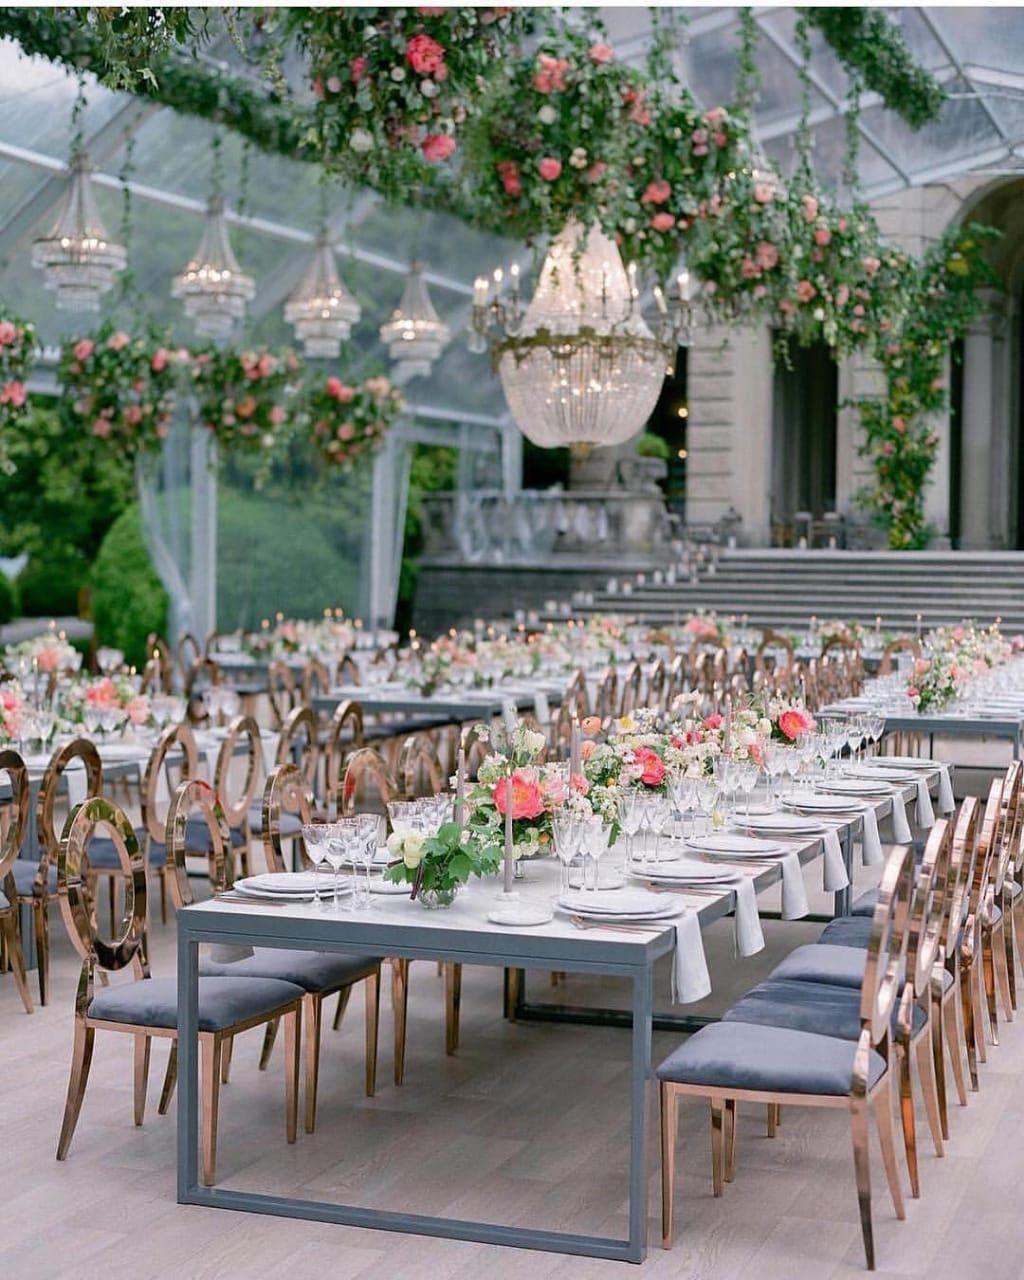 Best Wedding Decorations 2019 Top Wedding Decor Trends that will Rage in 2019! | Unique Wedding